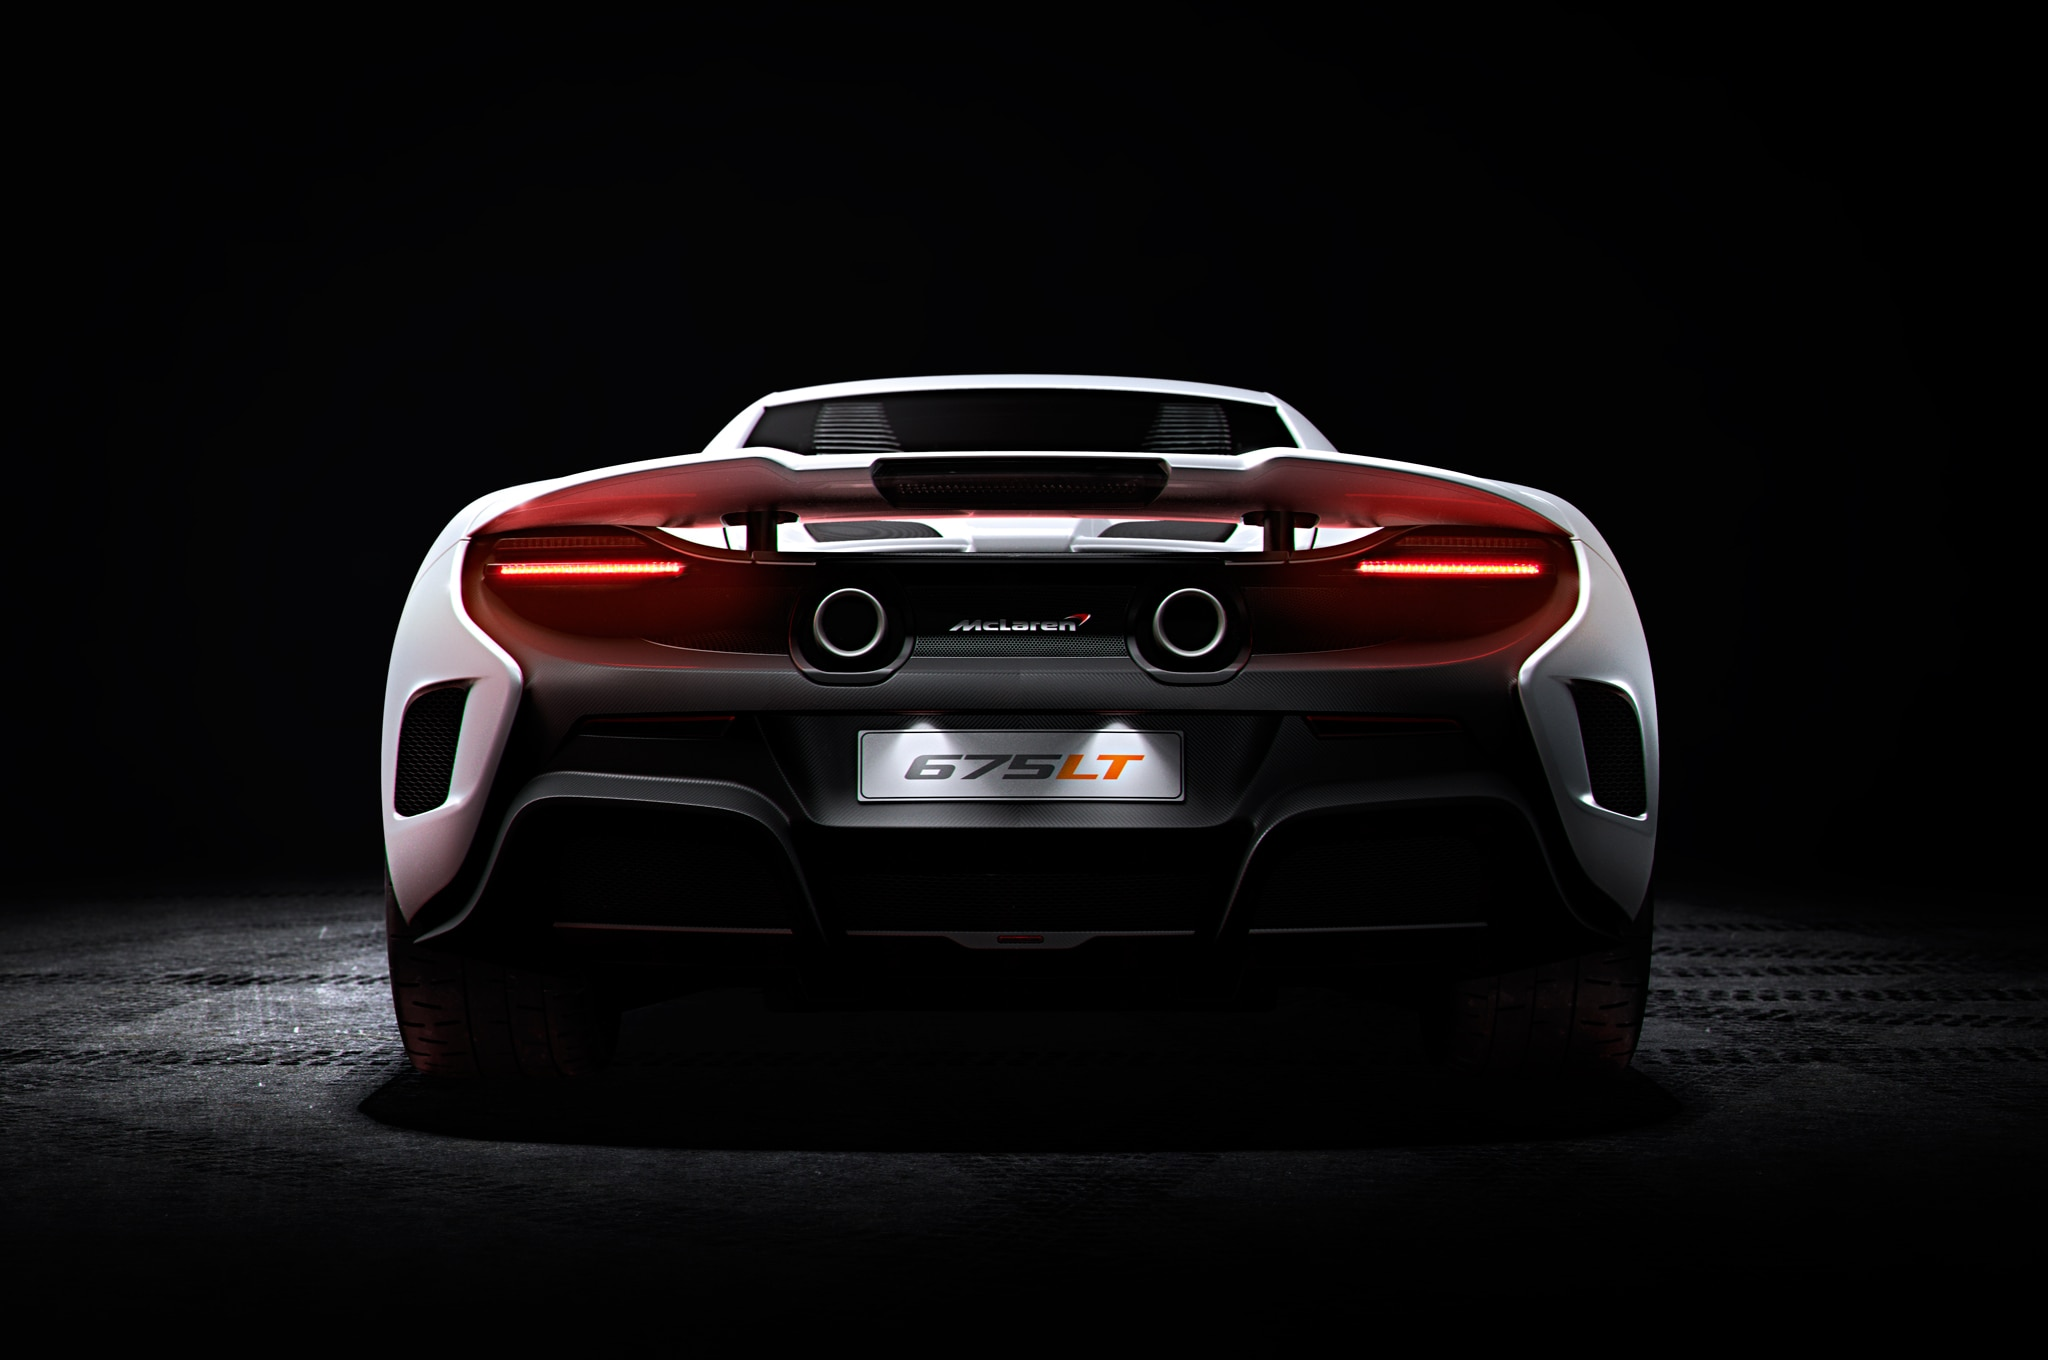 Rumor Mclaren To Spawn All Electric Supercar Automobile Magazine